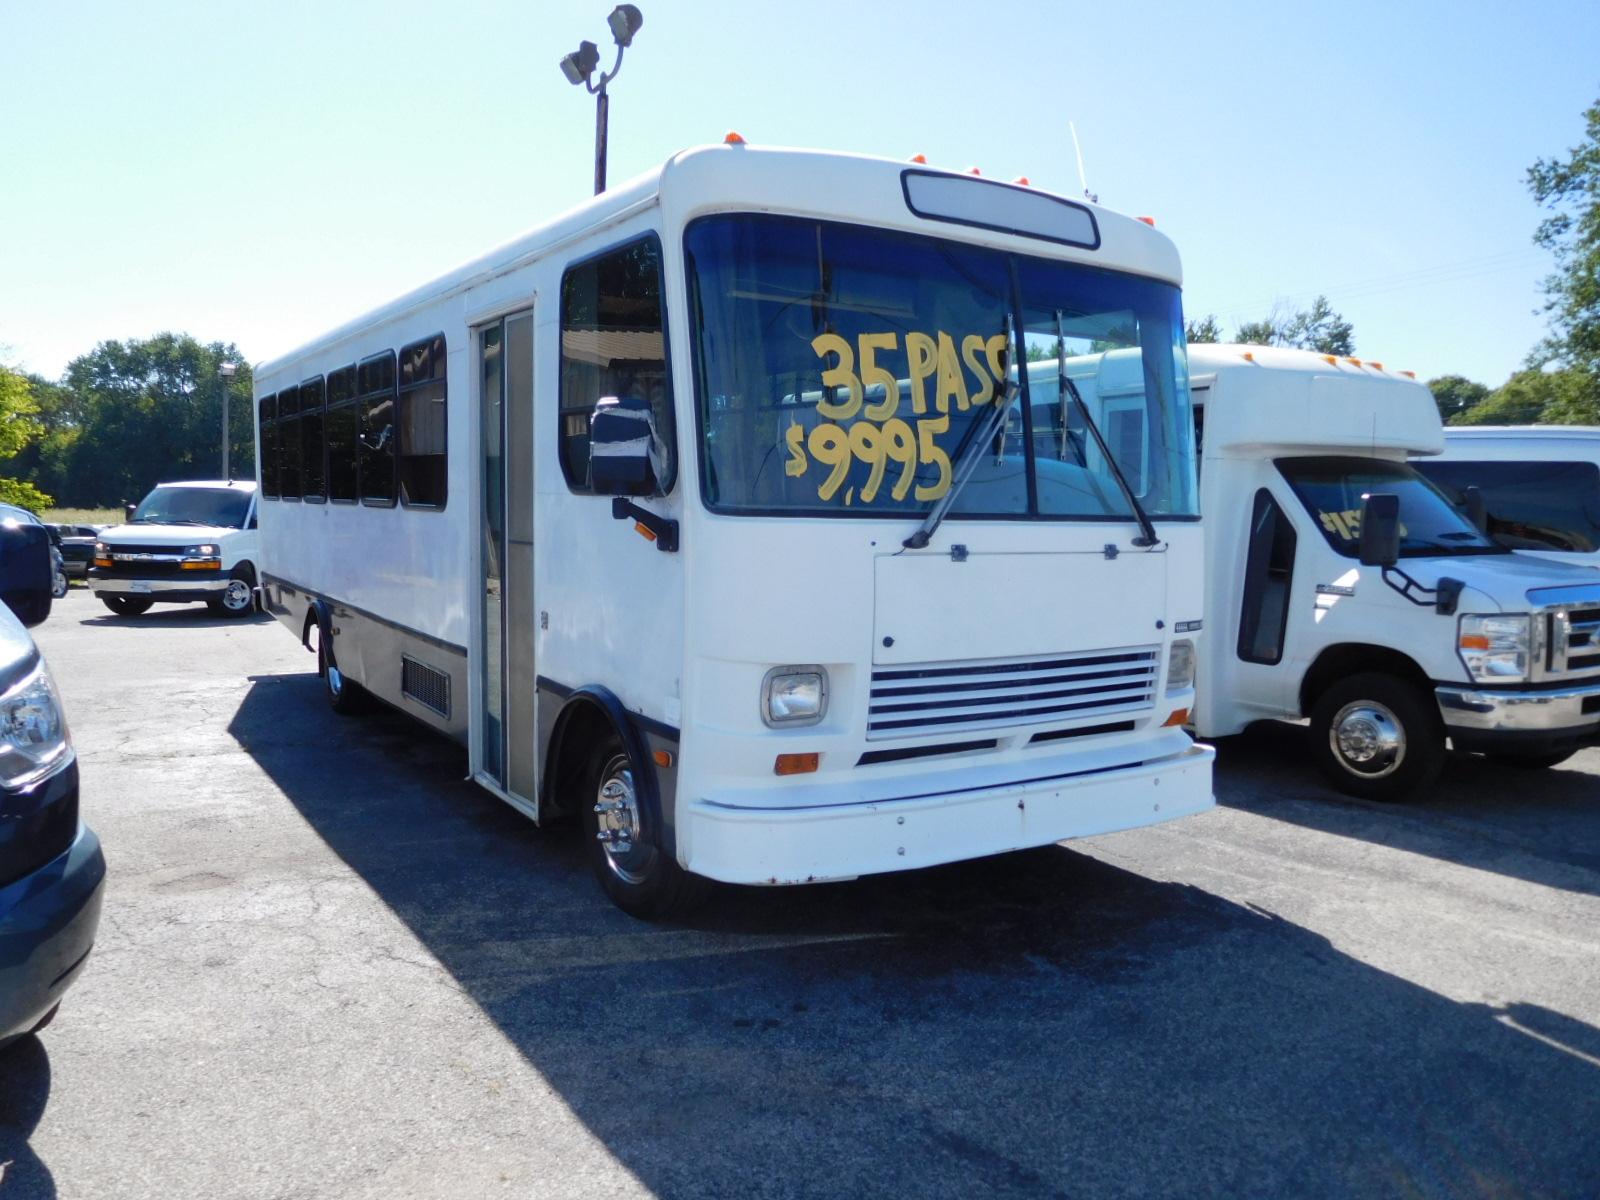 Ram Van Reservation >> Cook & Reeves Van Sales & Rentals